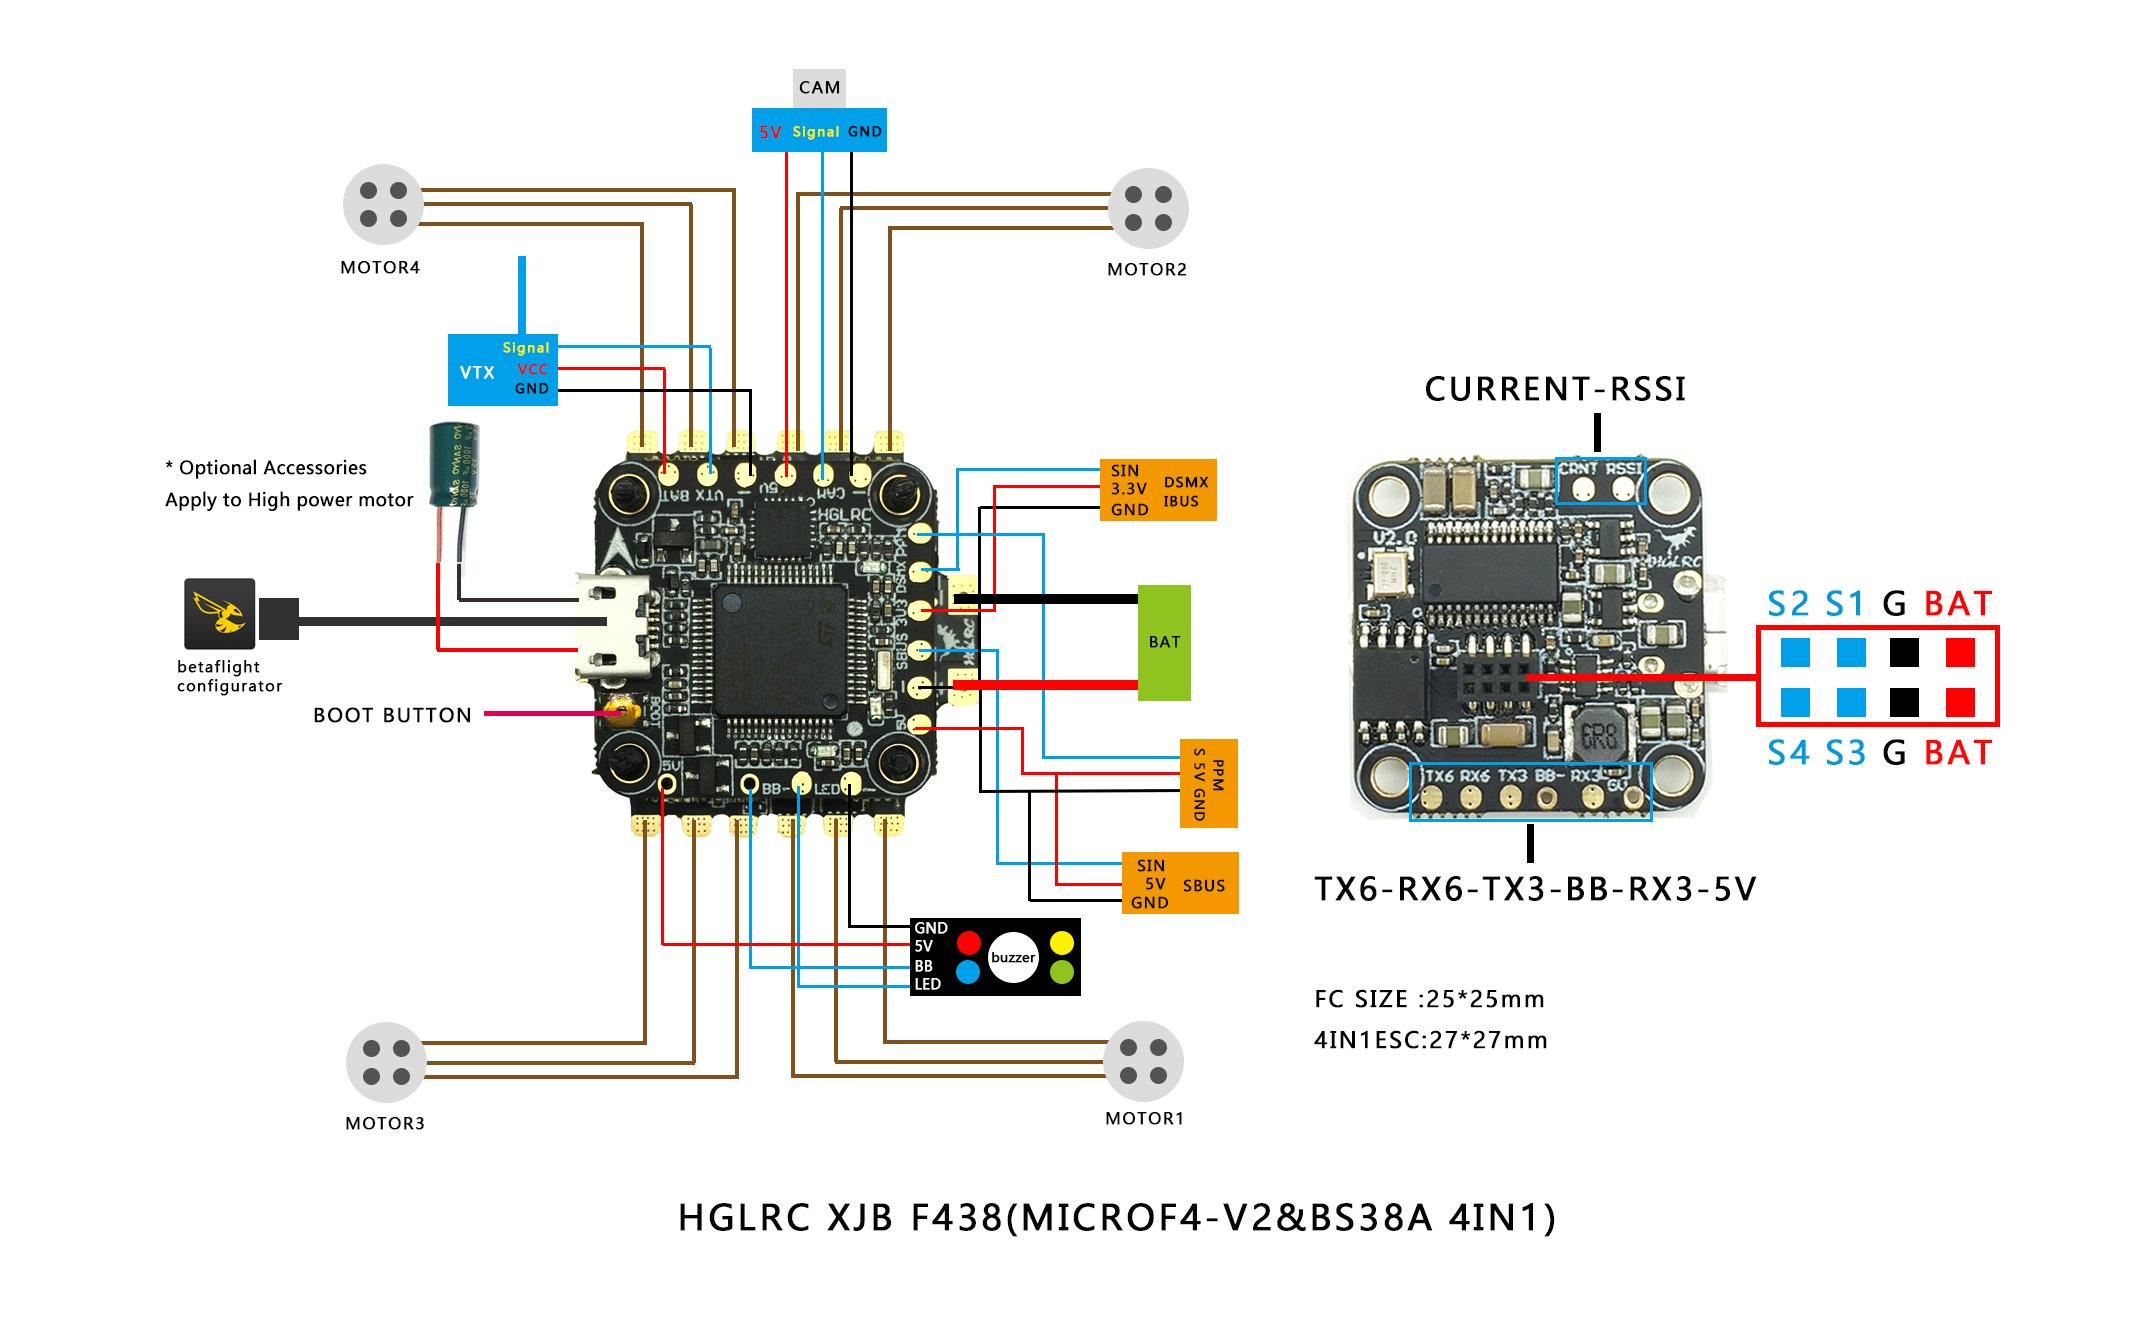 hglrc xjb f438-tx20 v2